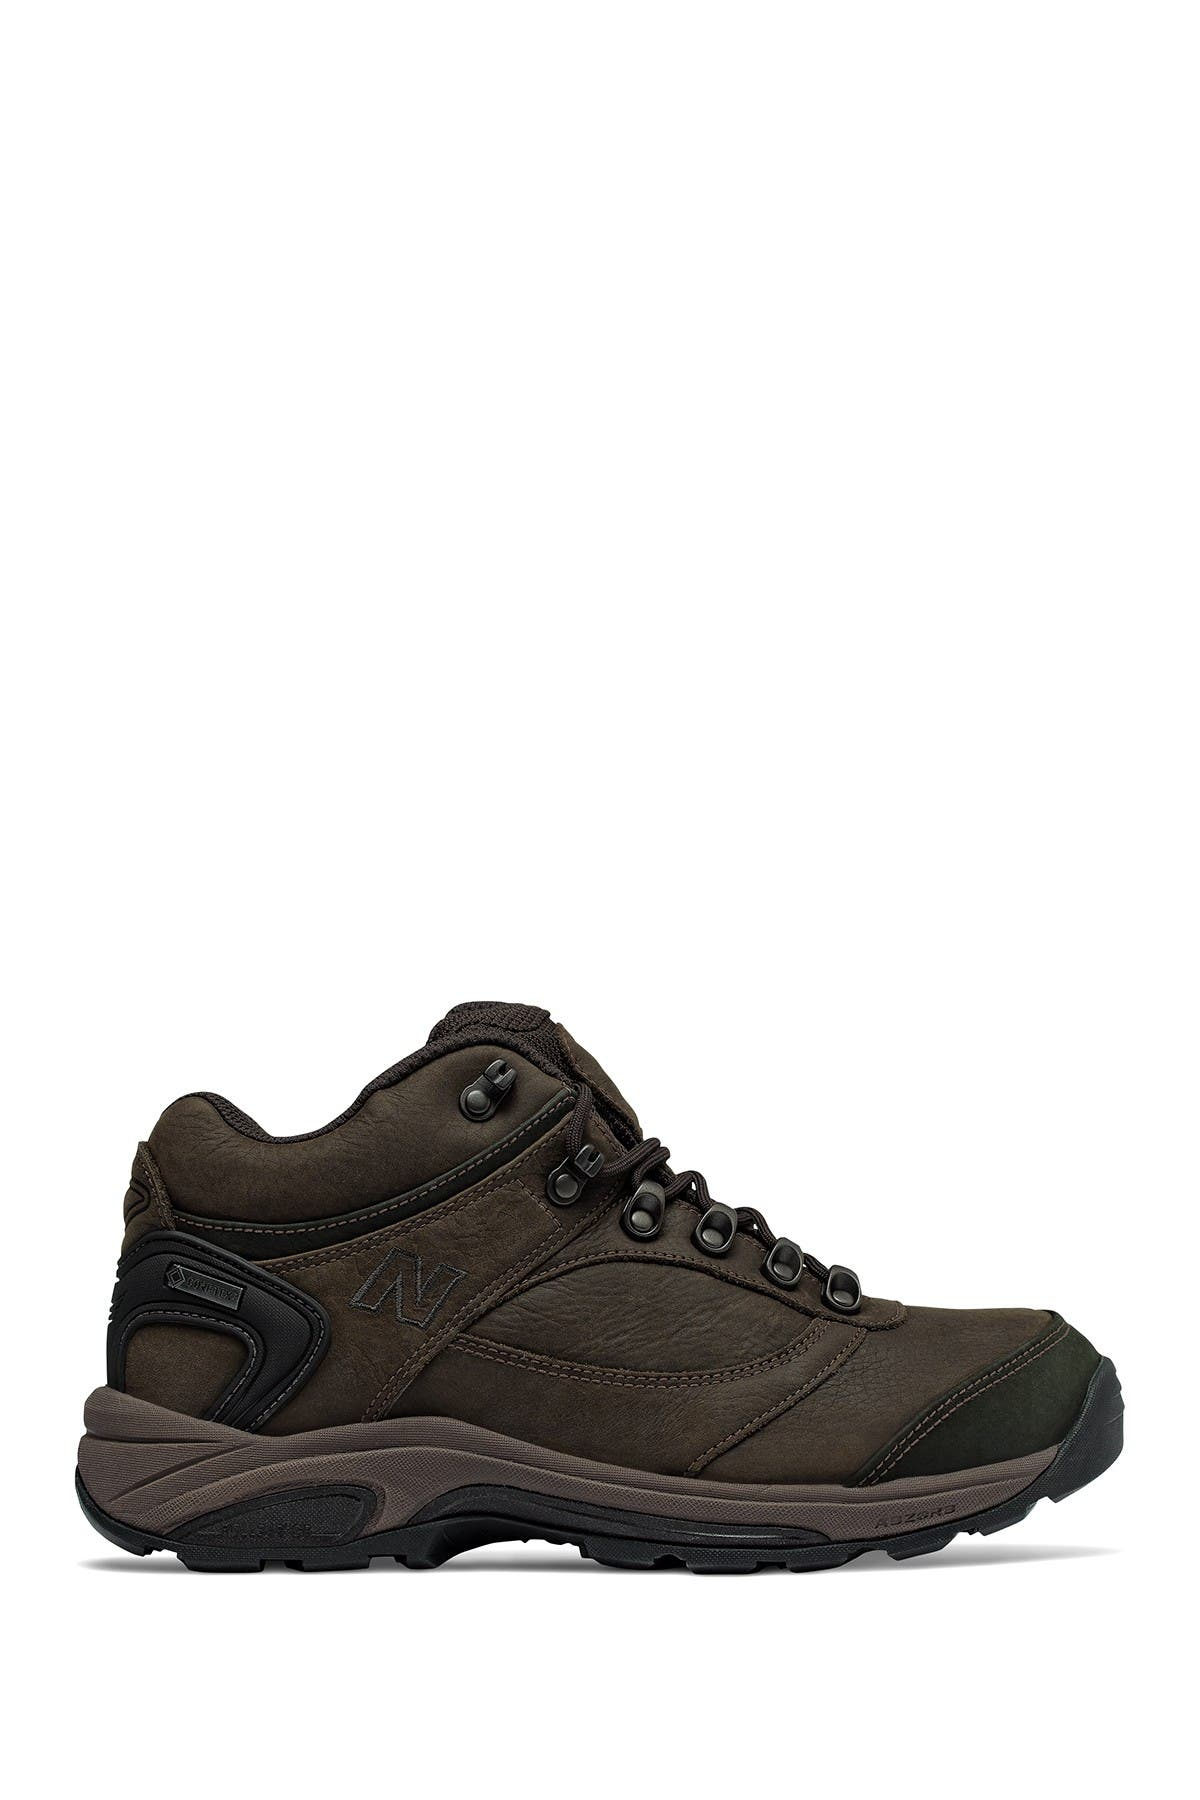 New Balance | 978 Outdoor Walking Shoe